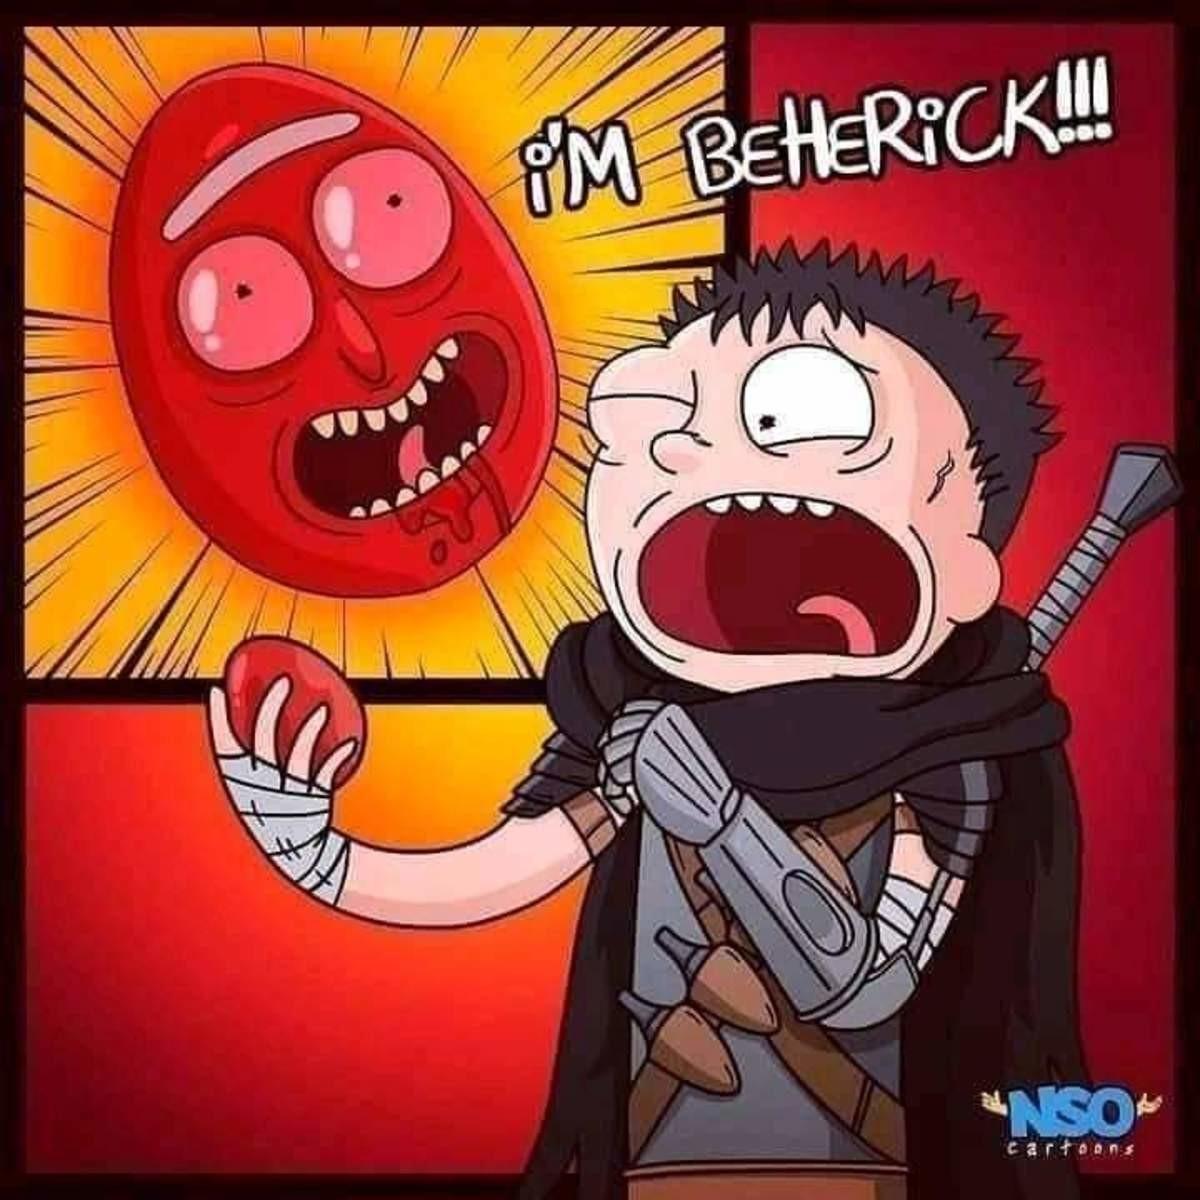 Beherick. .